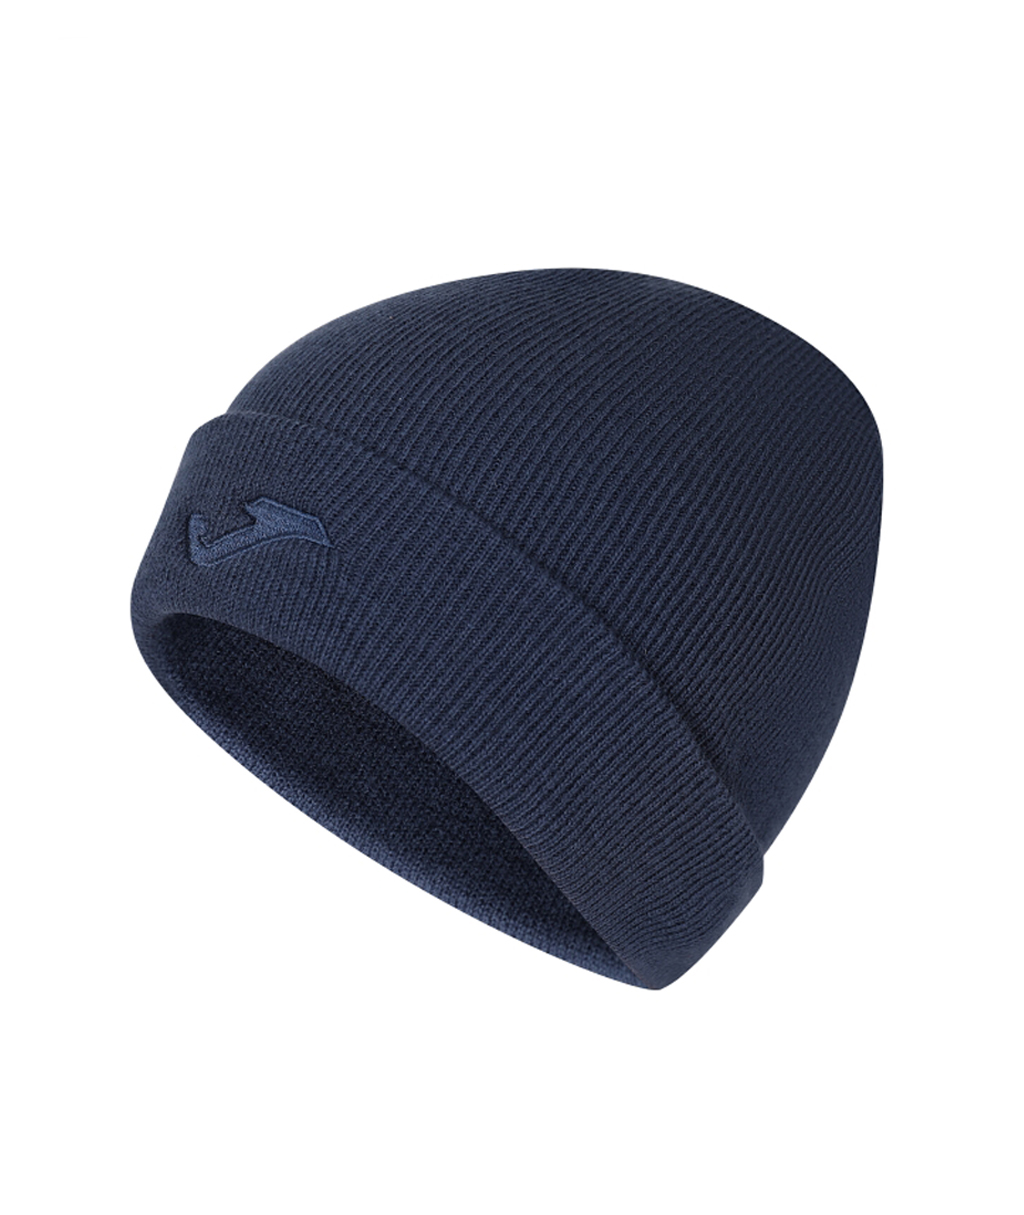 Купить тёмно-синюю шапку Joma Gorro 400360.331